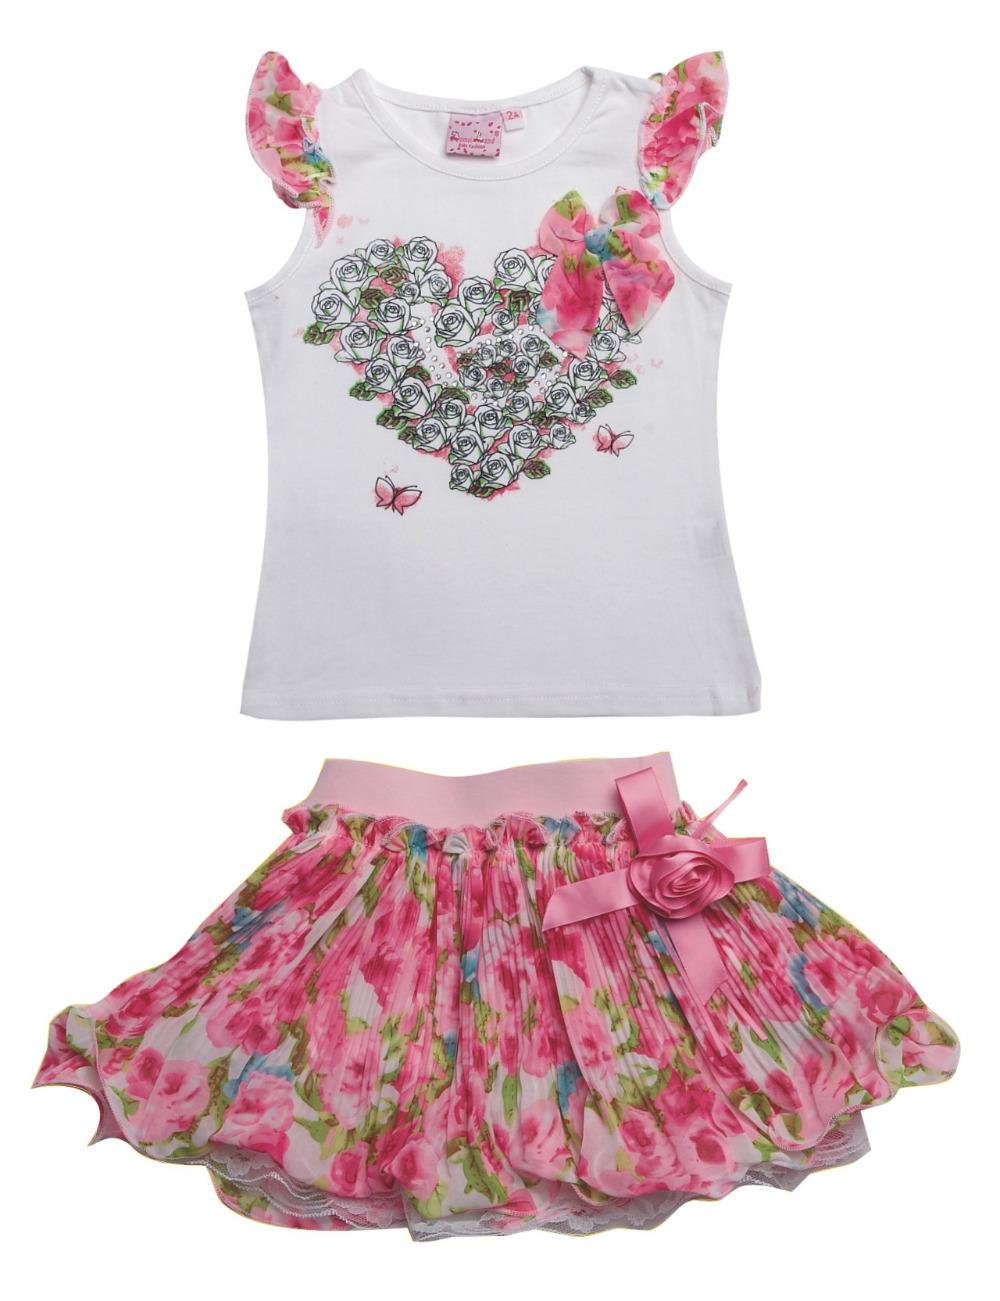 Cute online clothes